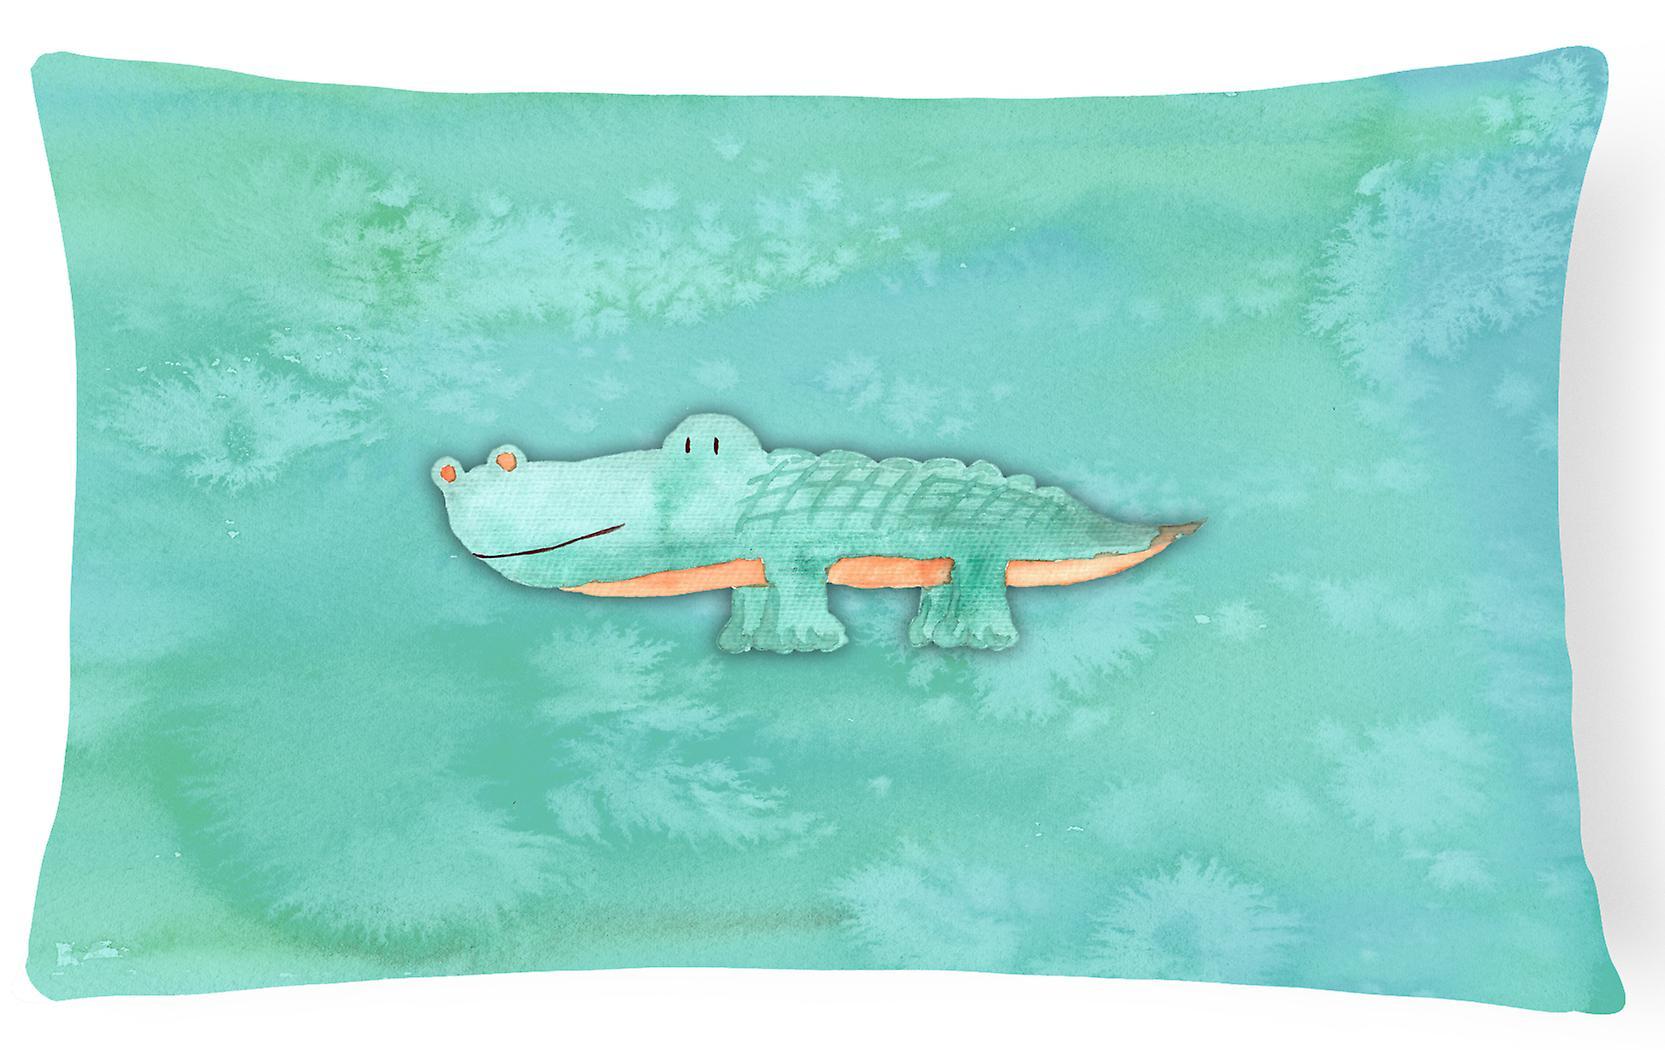 Aquarelle Décoratif Alligator Tissu Oreiller Toile OkXZwuPiT